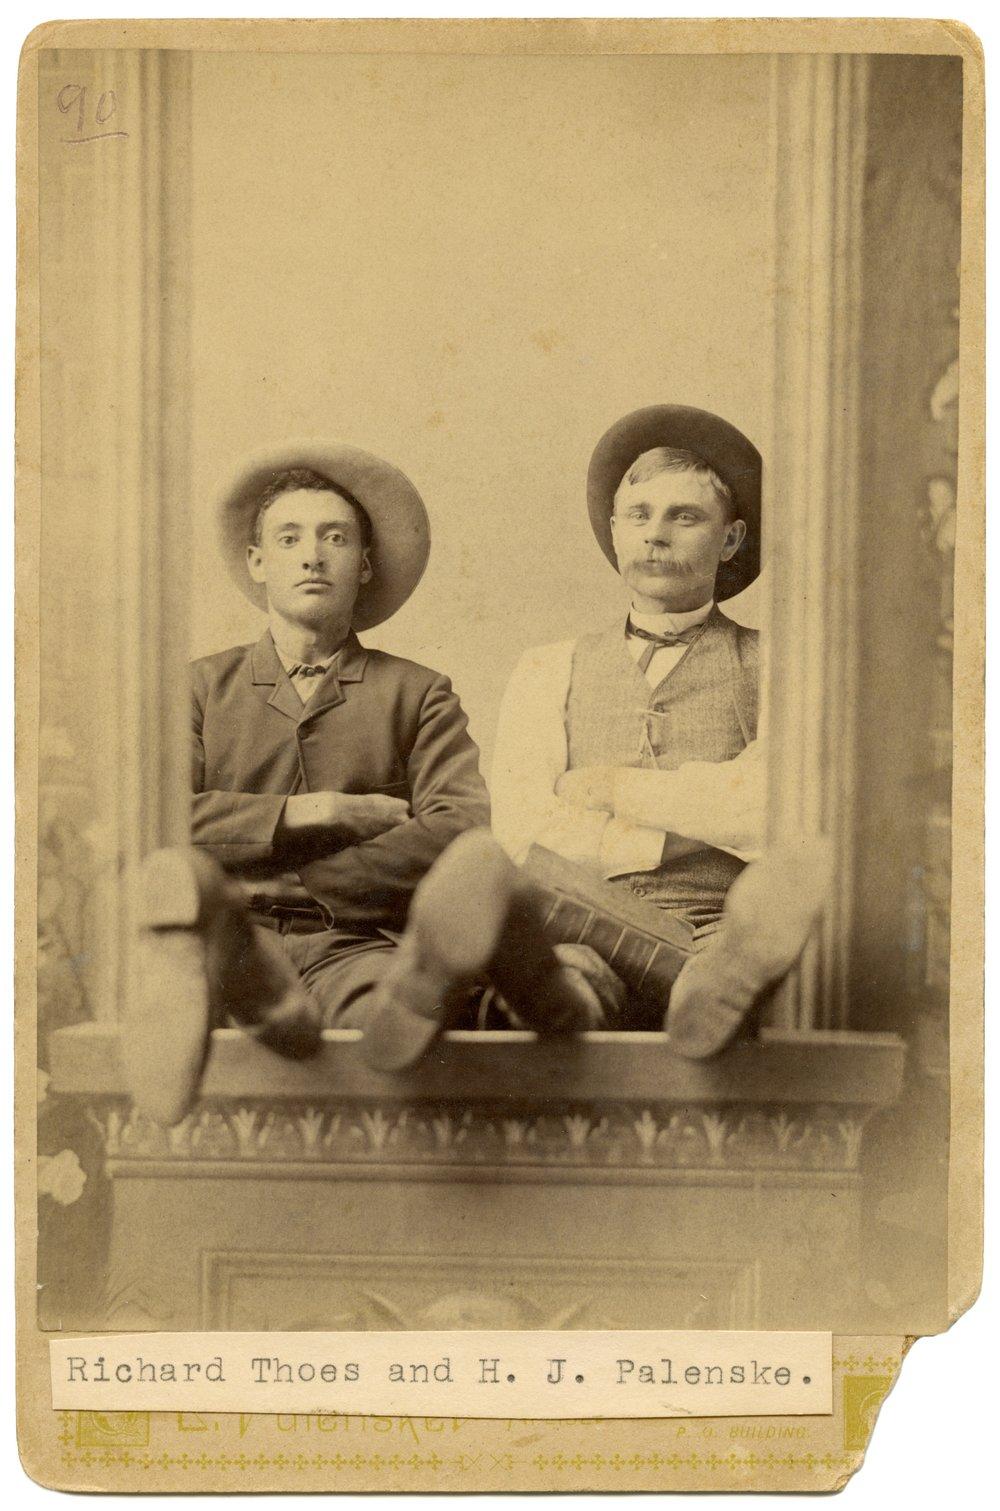 Richard Thoes and H. J. Palenske - 1